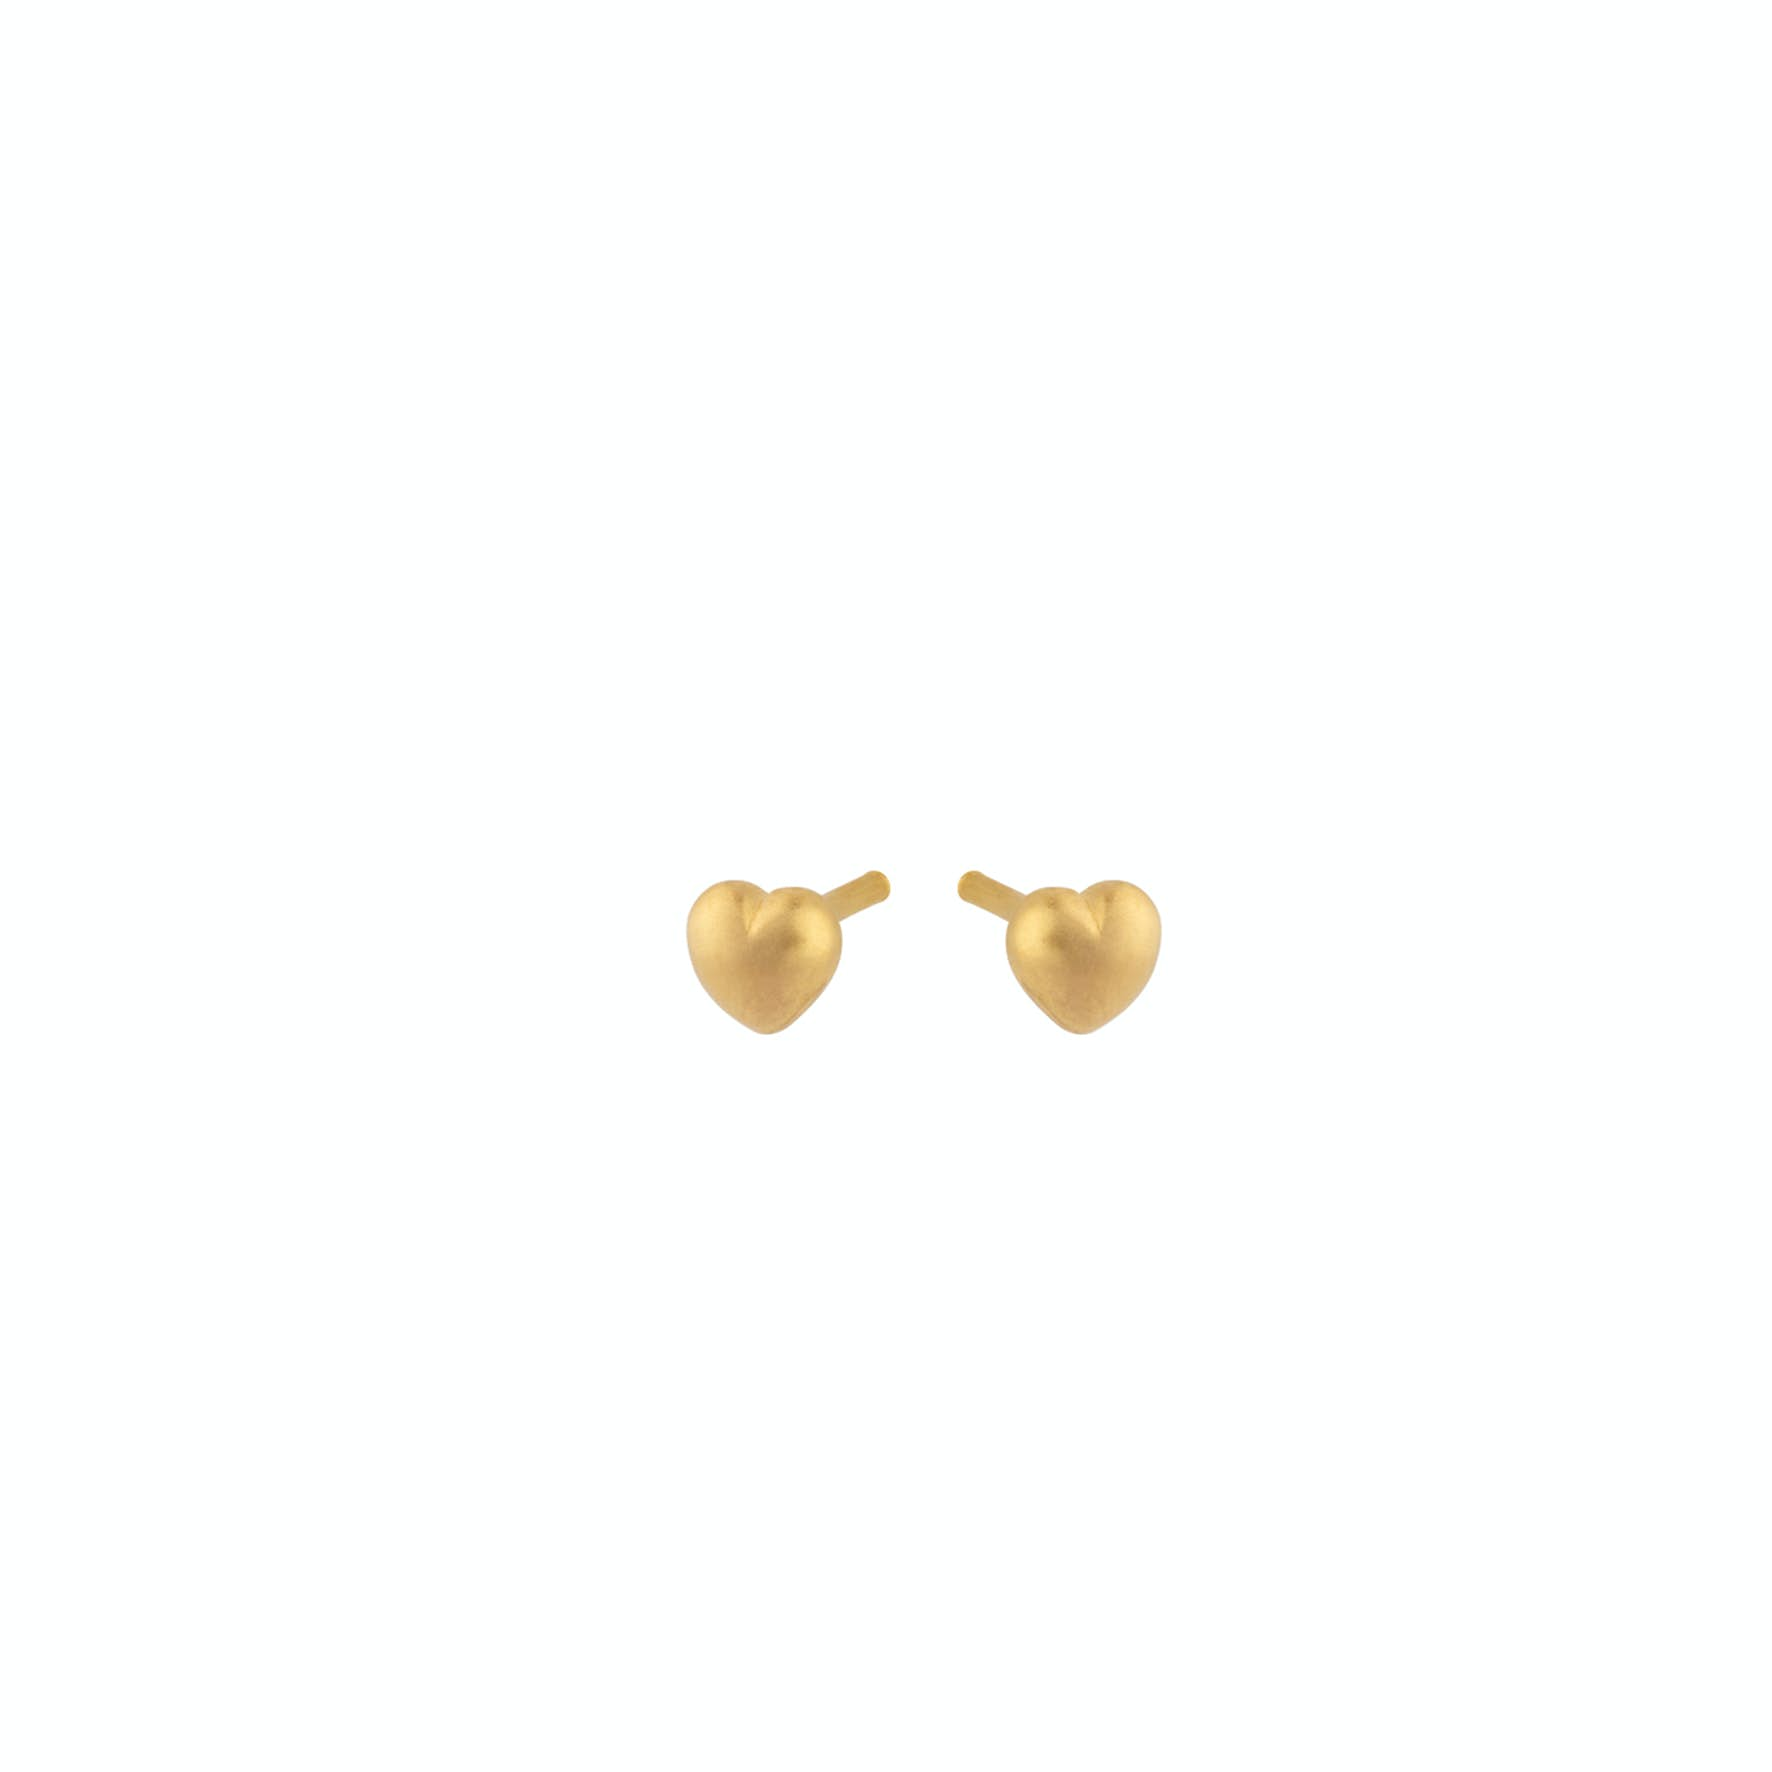 Heart Earsticks from Pernille Corydon in Goldplated-Silver Sterling 925